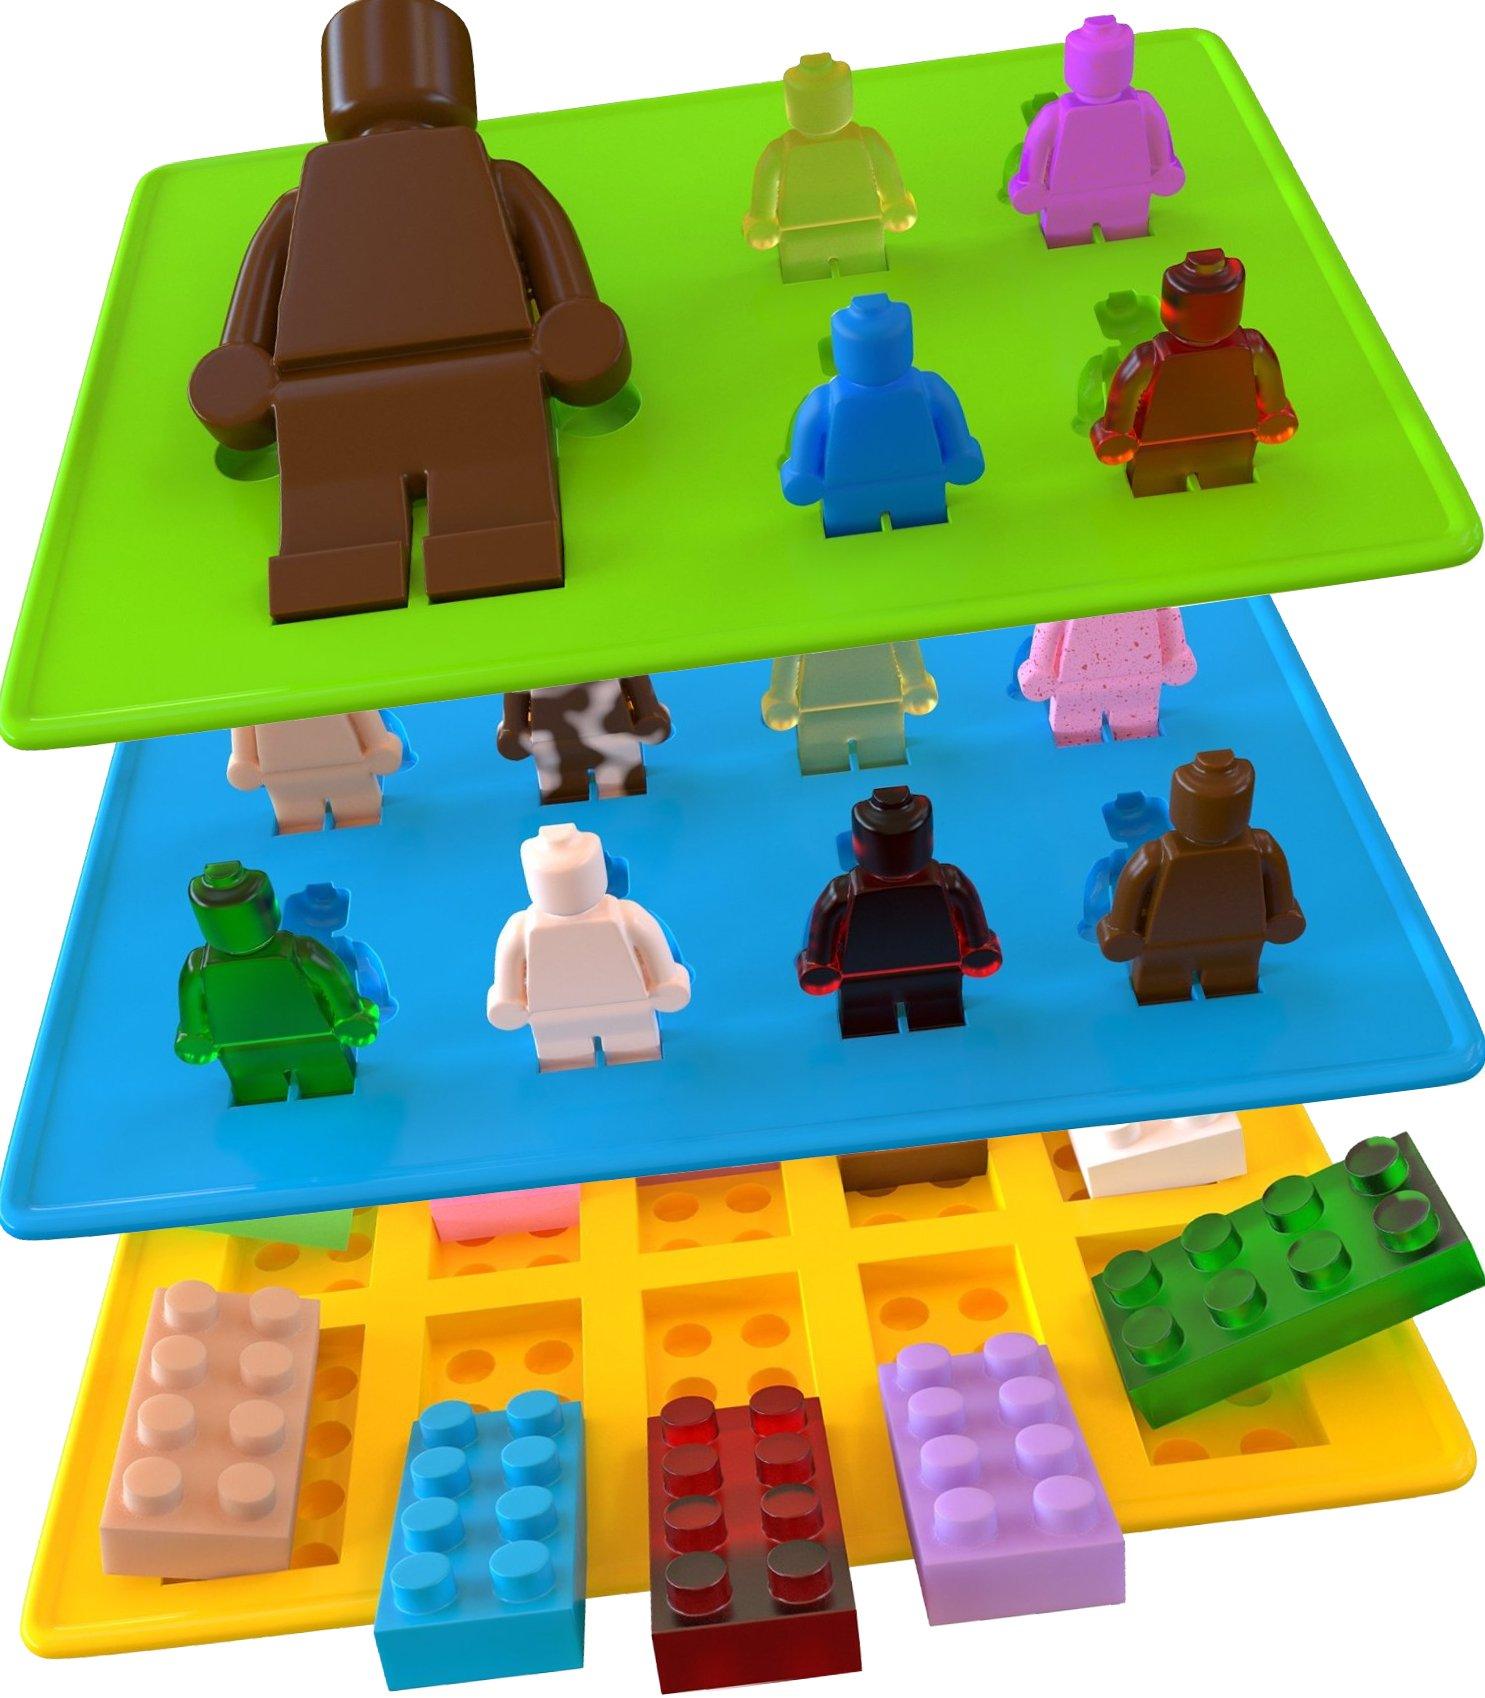 ... Molds Silicone Ice Cube Tray Lego Building Blocks Jello An | eBay